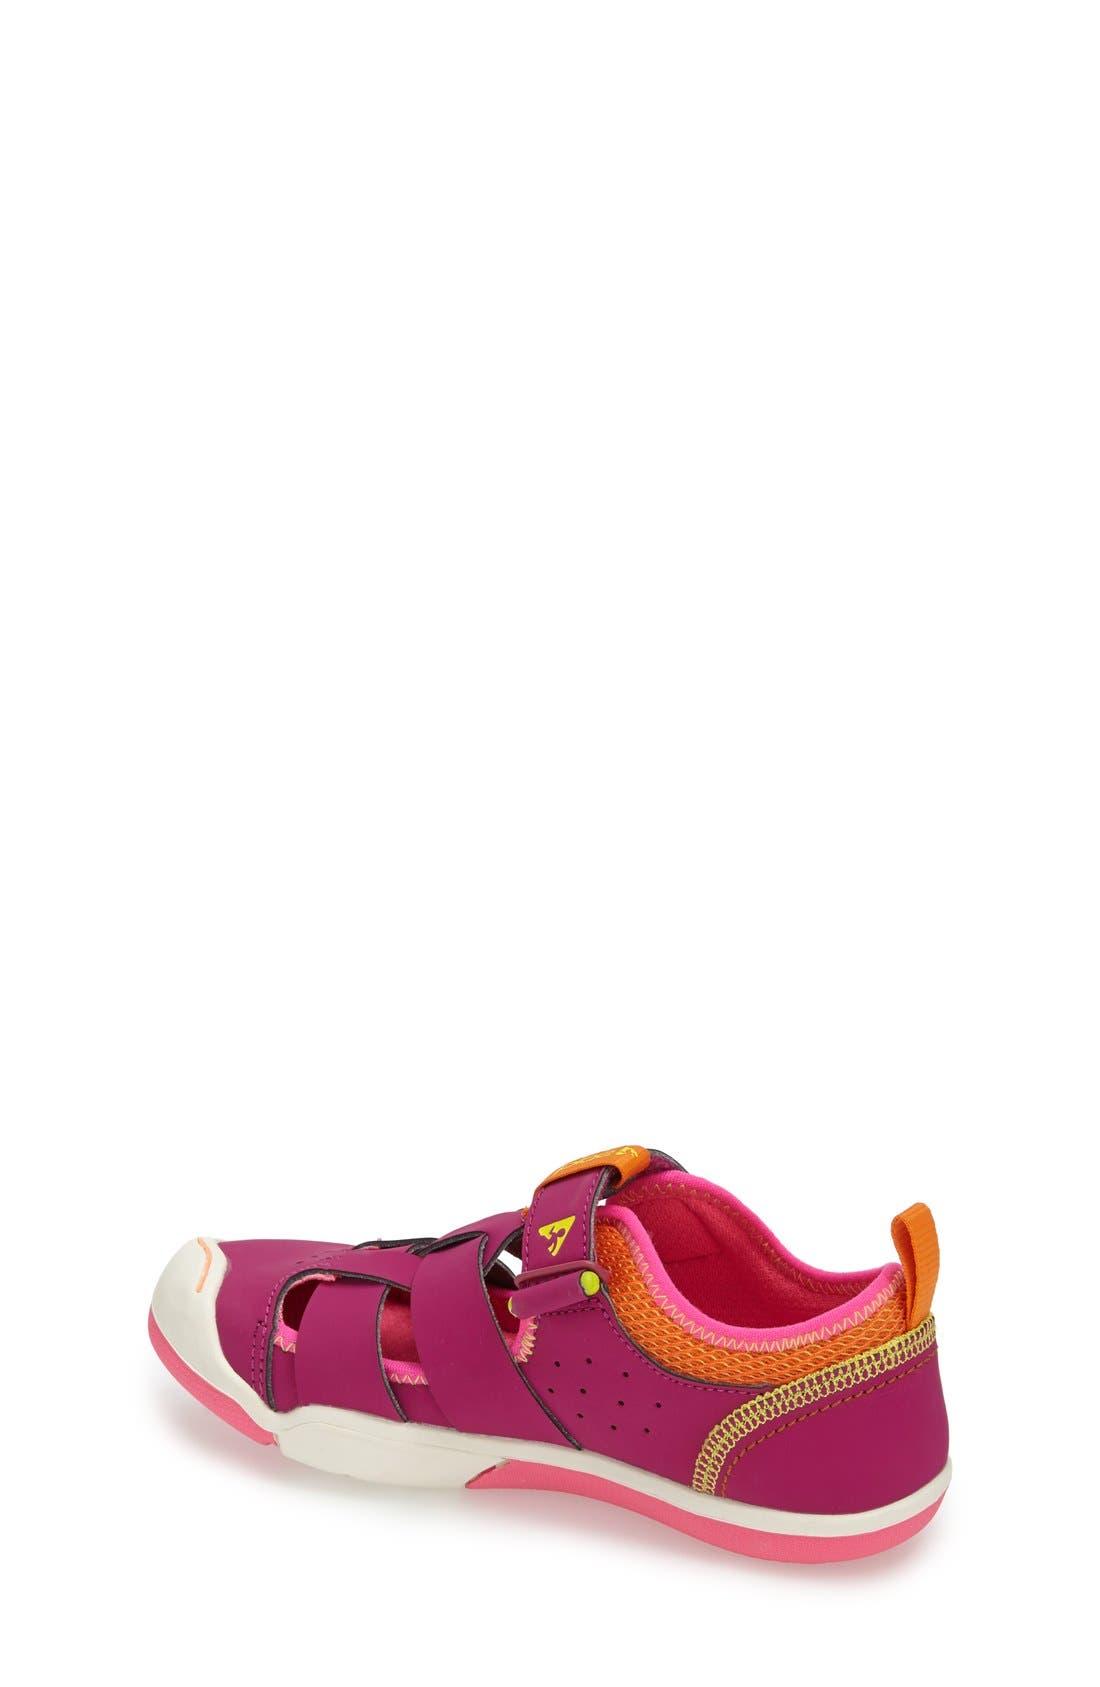 'Sam' Customizable Sneaker,                             Alternate thumbnail 2, color,                             Festival Fuchsia